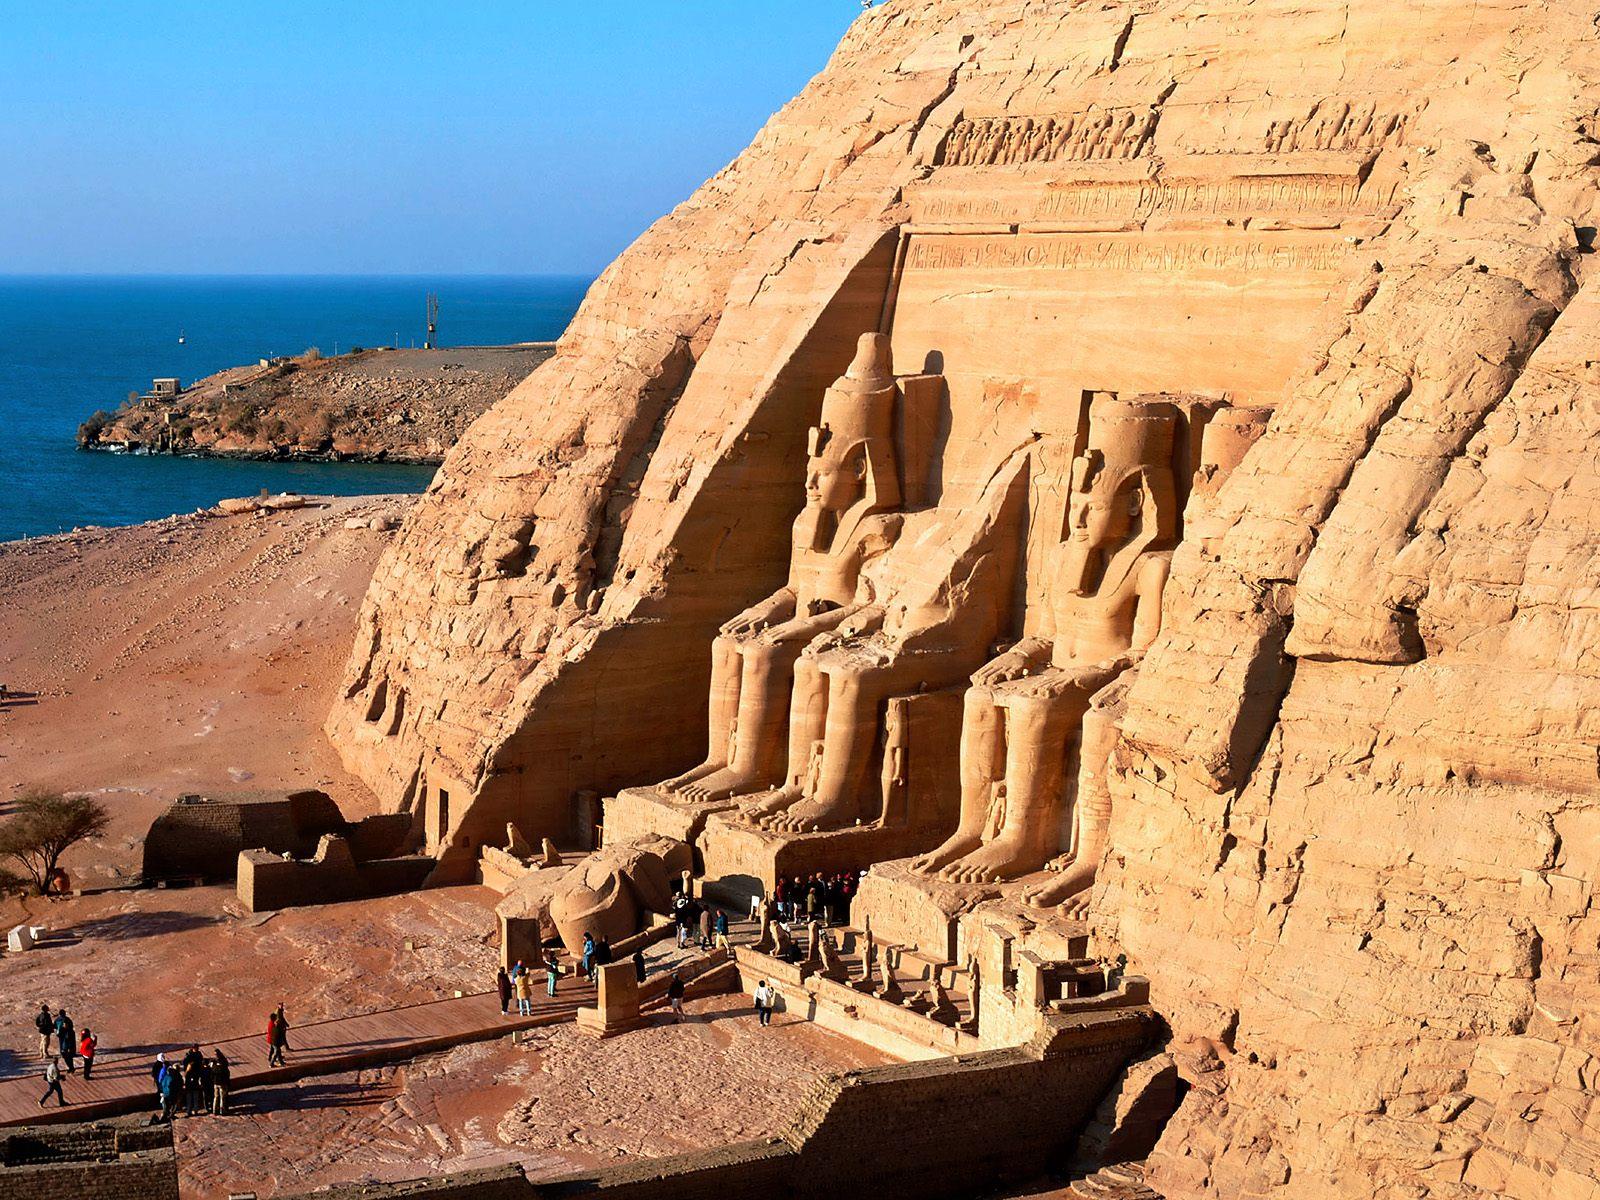 Aswan - Egypt Pharaonic